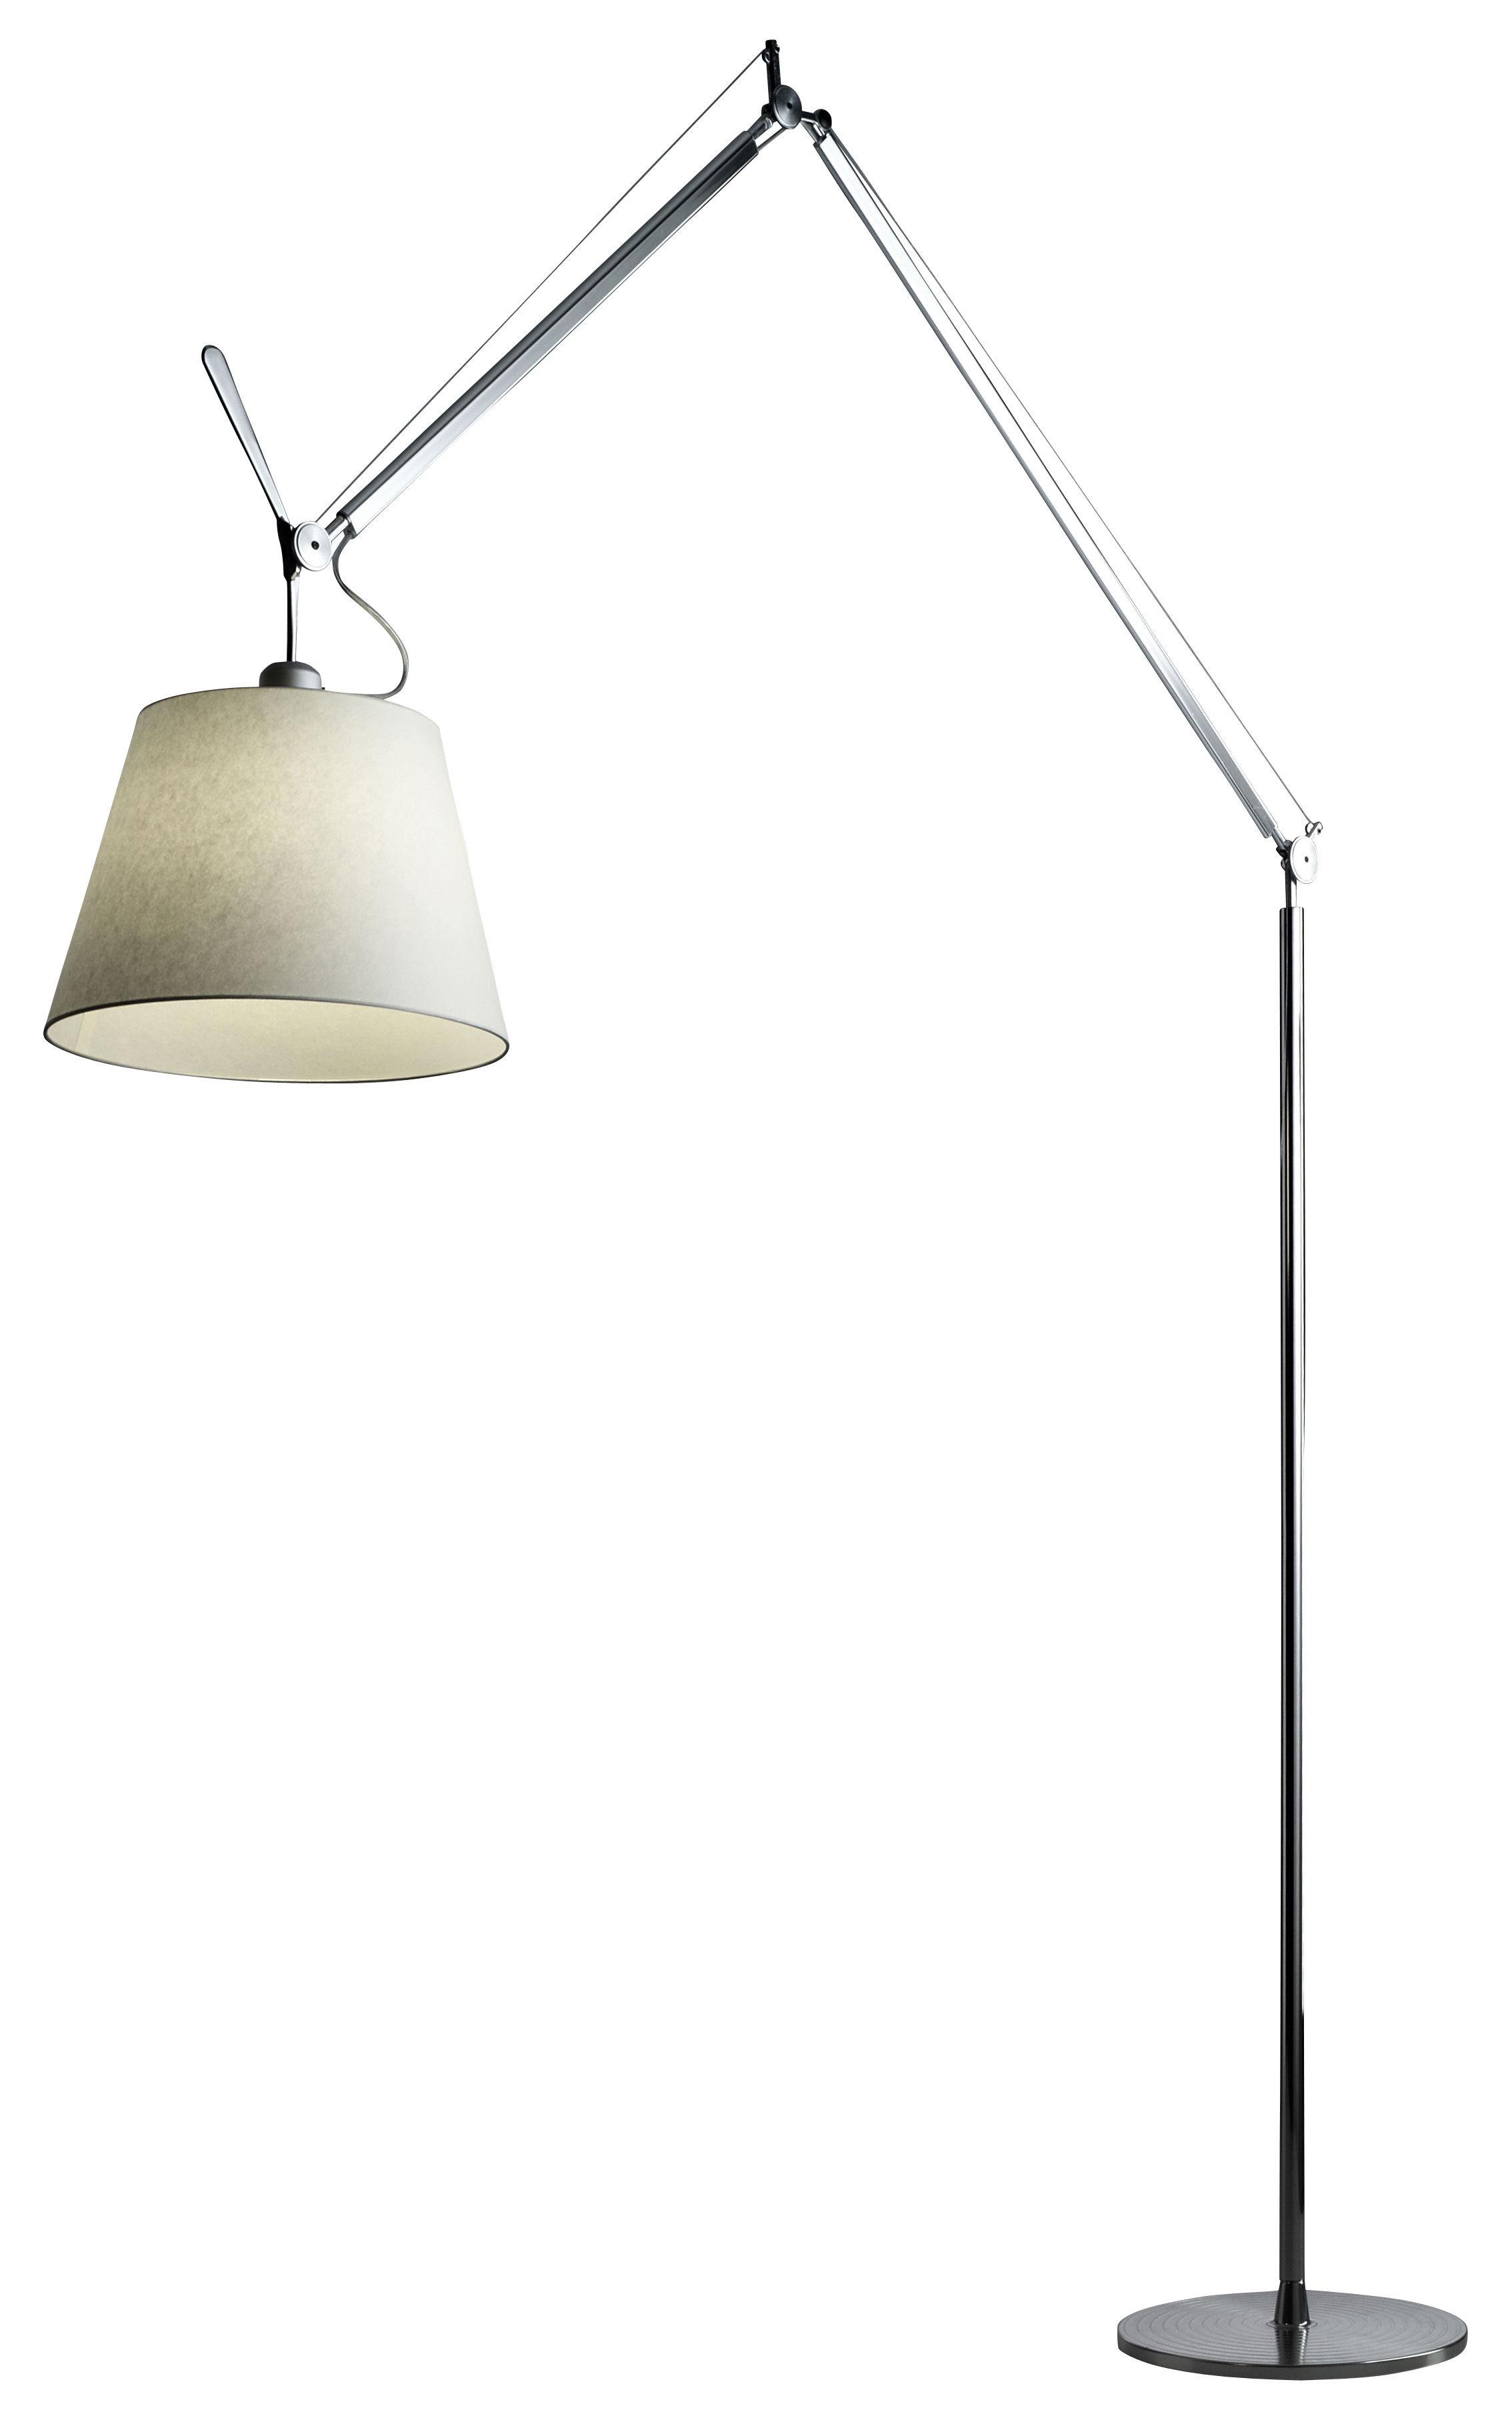 Luminaire - Lampadaires - Lampadaire Tolomeo Mega / Ø 42 cm - H 148 à 327 cm - Artemide - Ecru / Pied alu - Aluminium, Papier parchemin